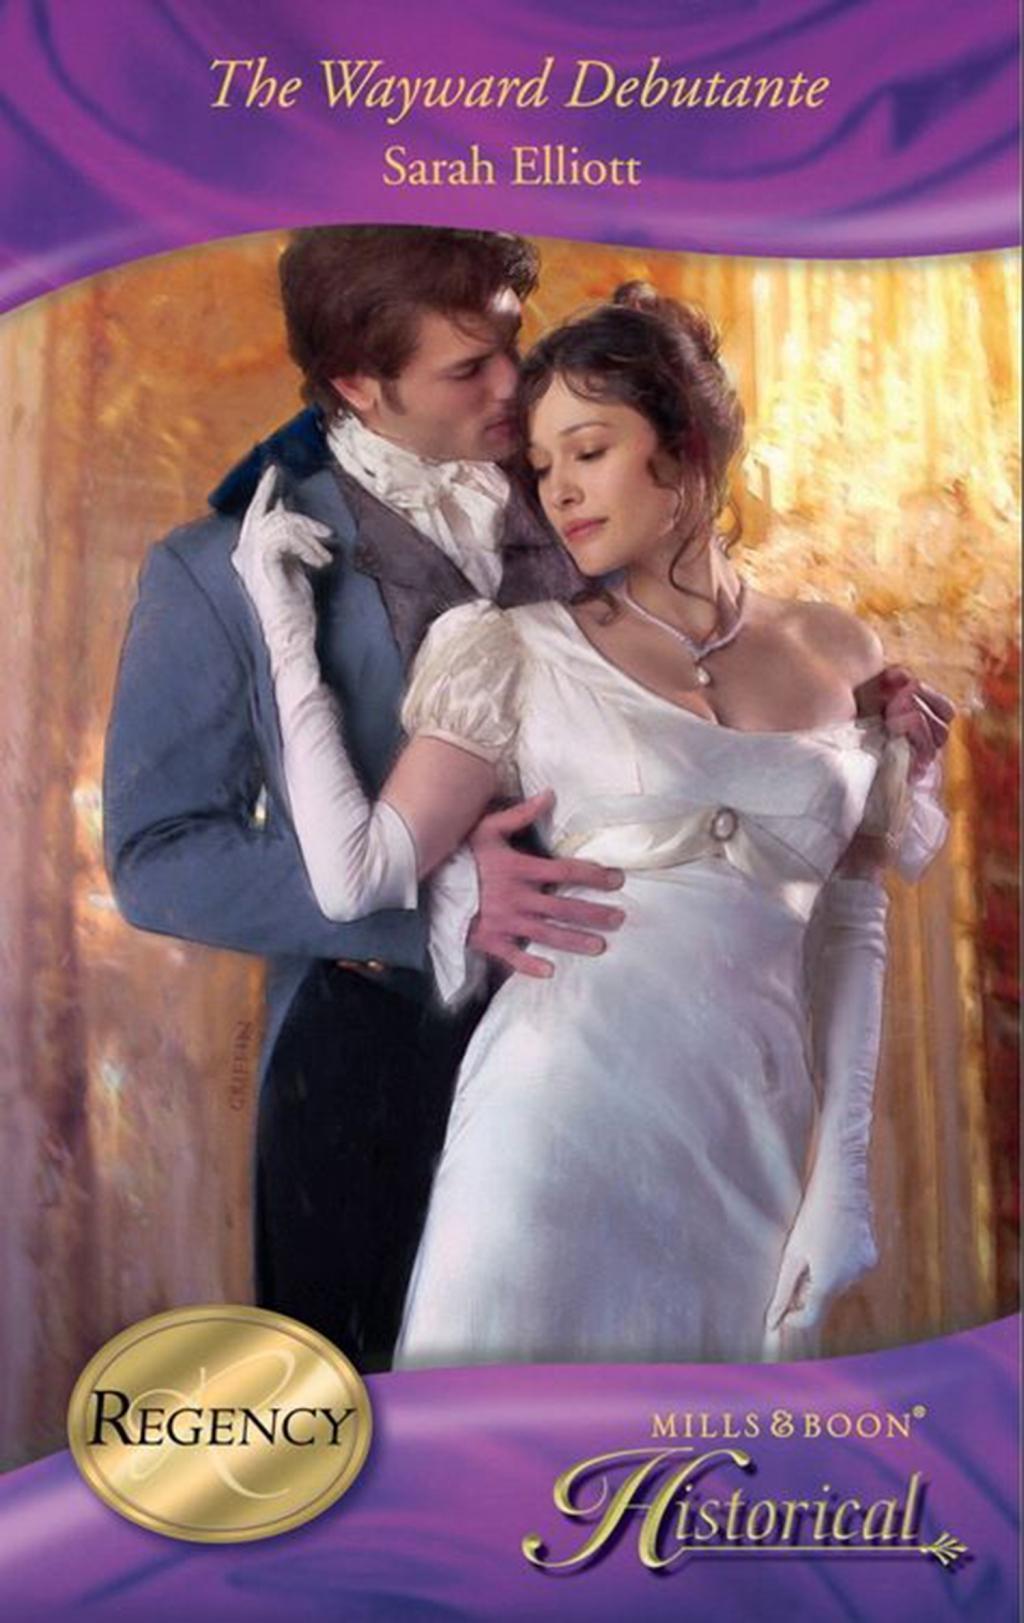 The Wayward Debutante (Mills & Boon Historical)